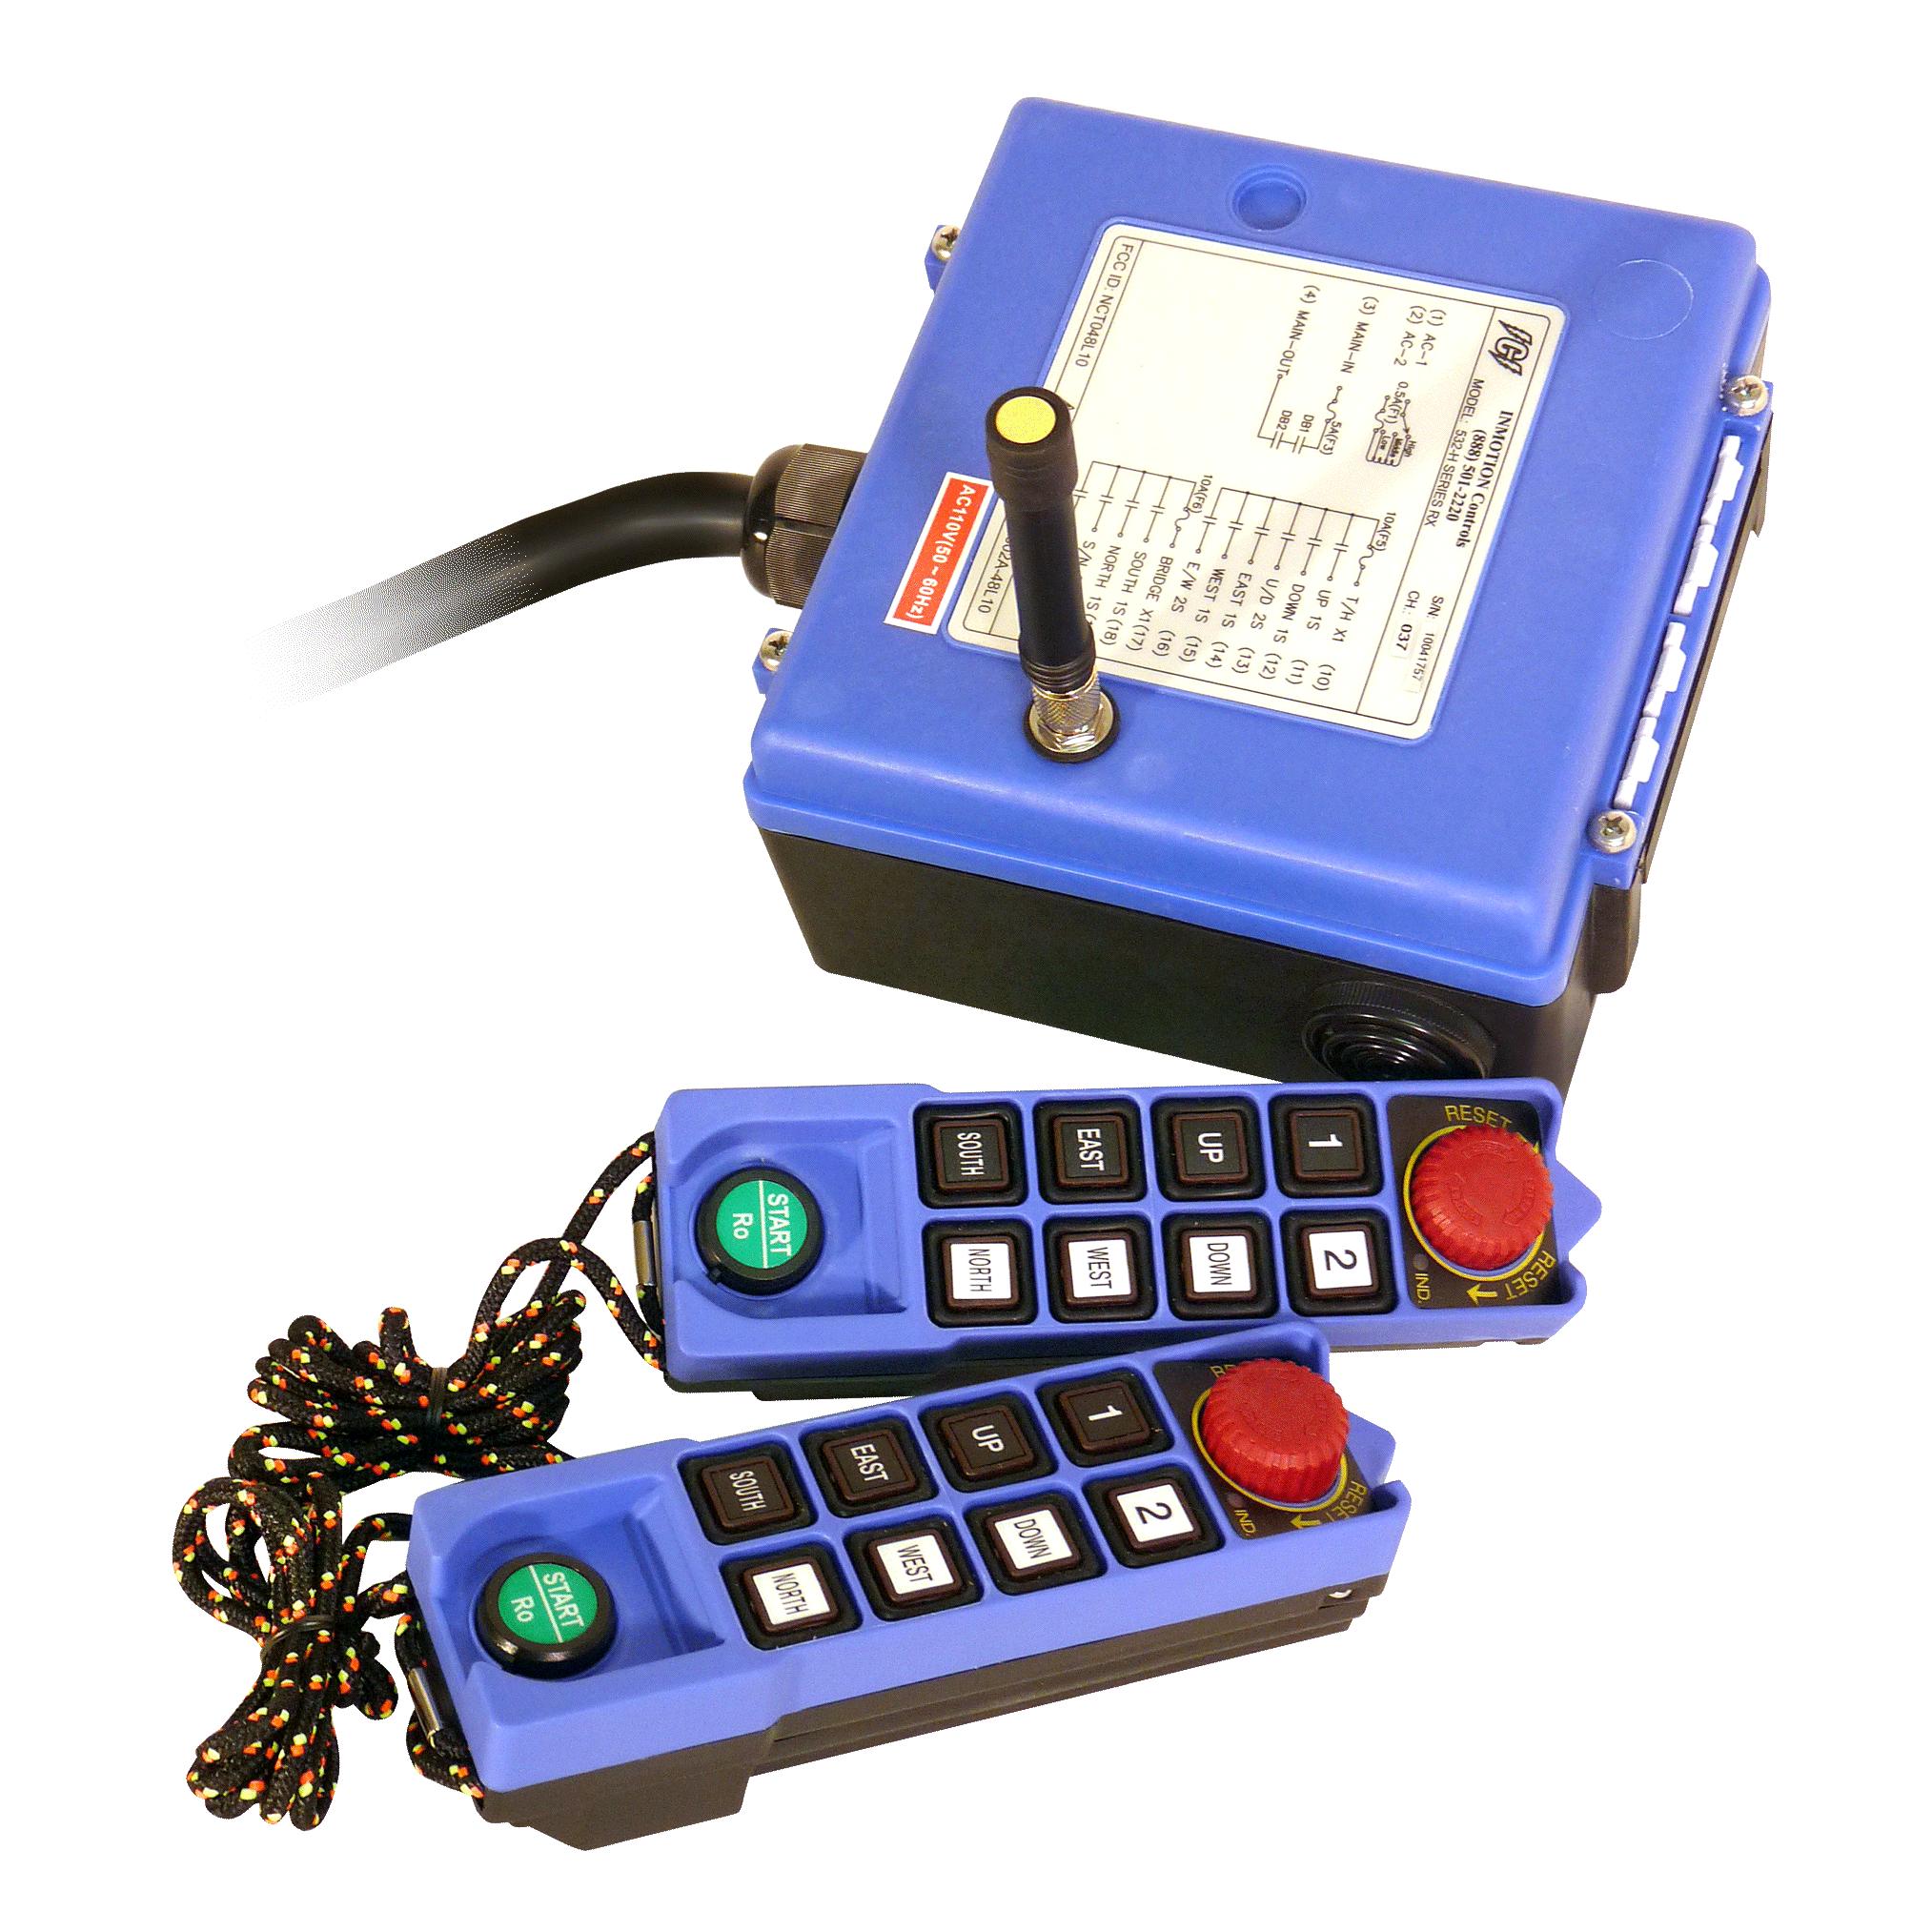 532-AB-SYSTEM-0